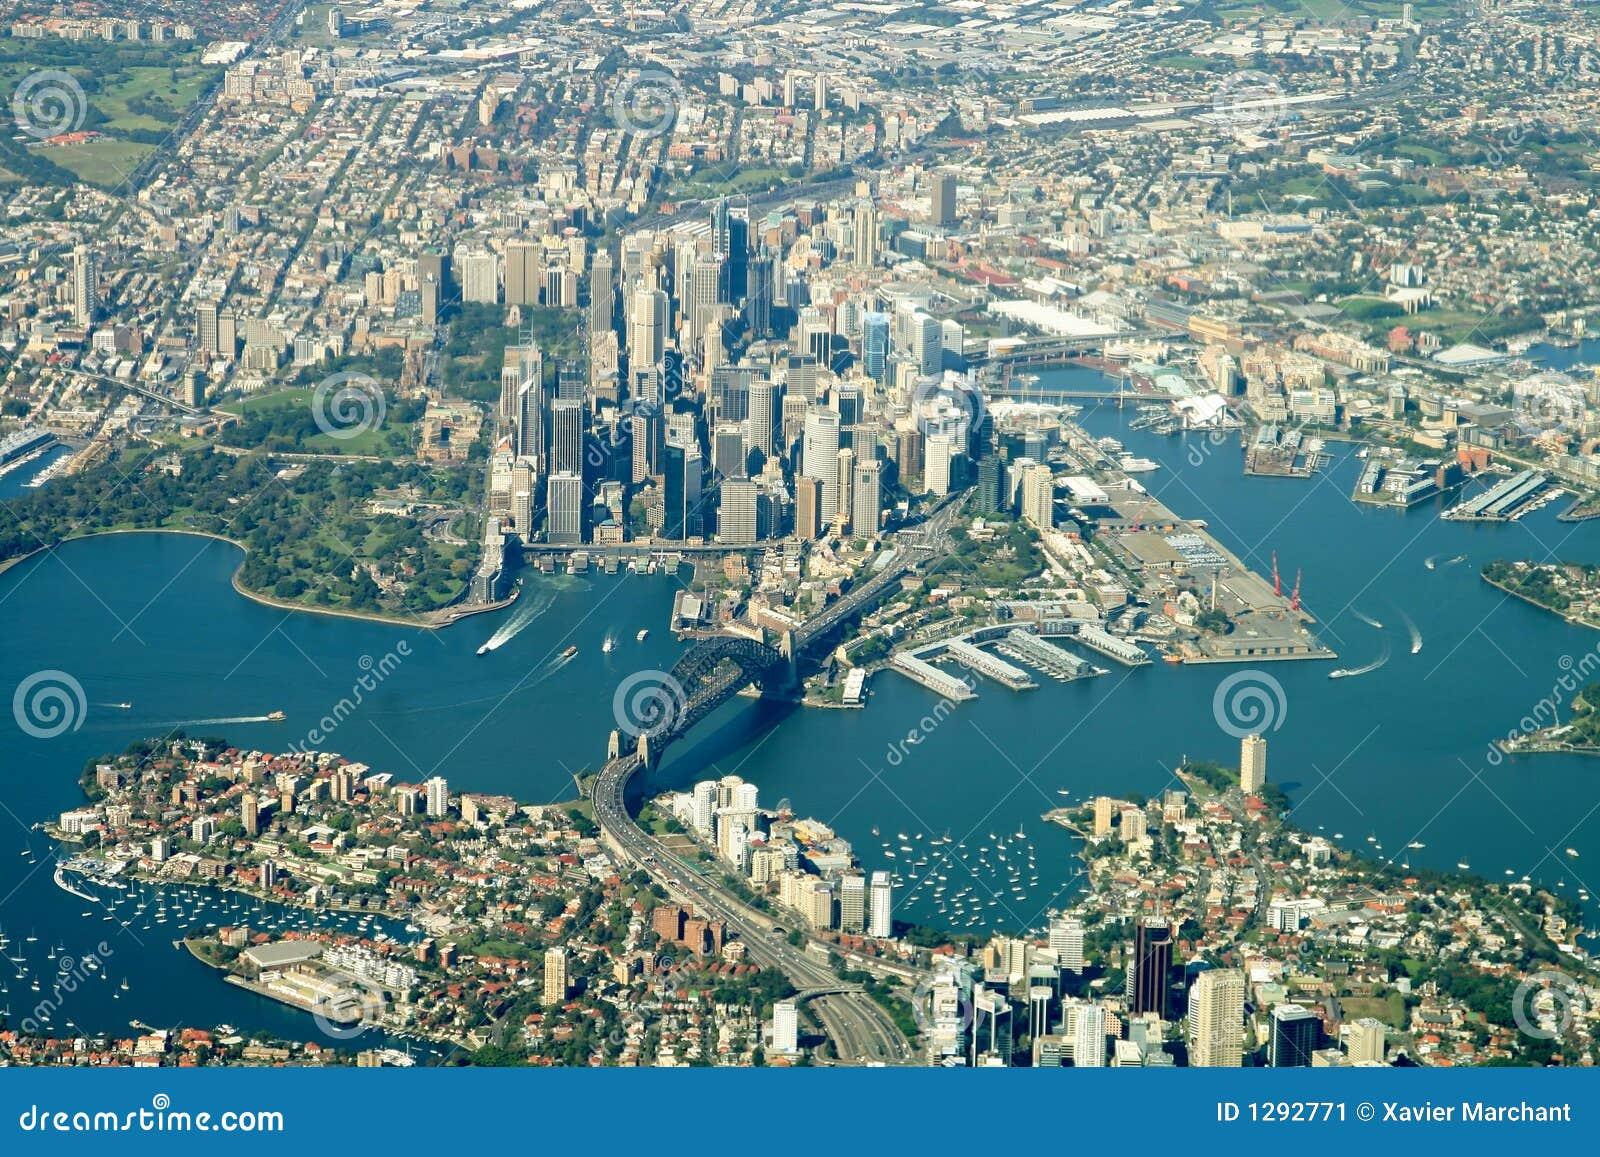 Sydney city center